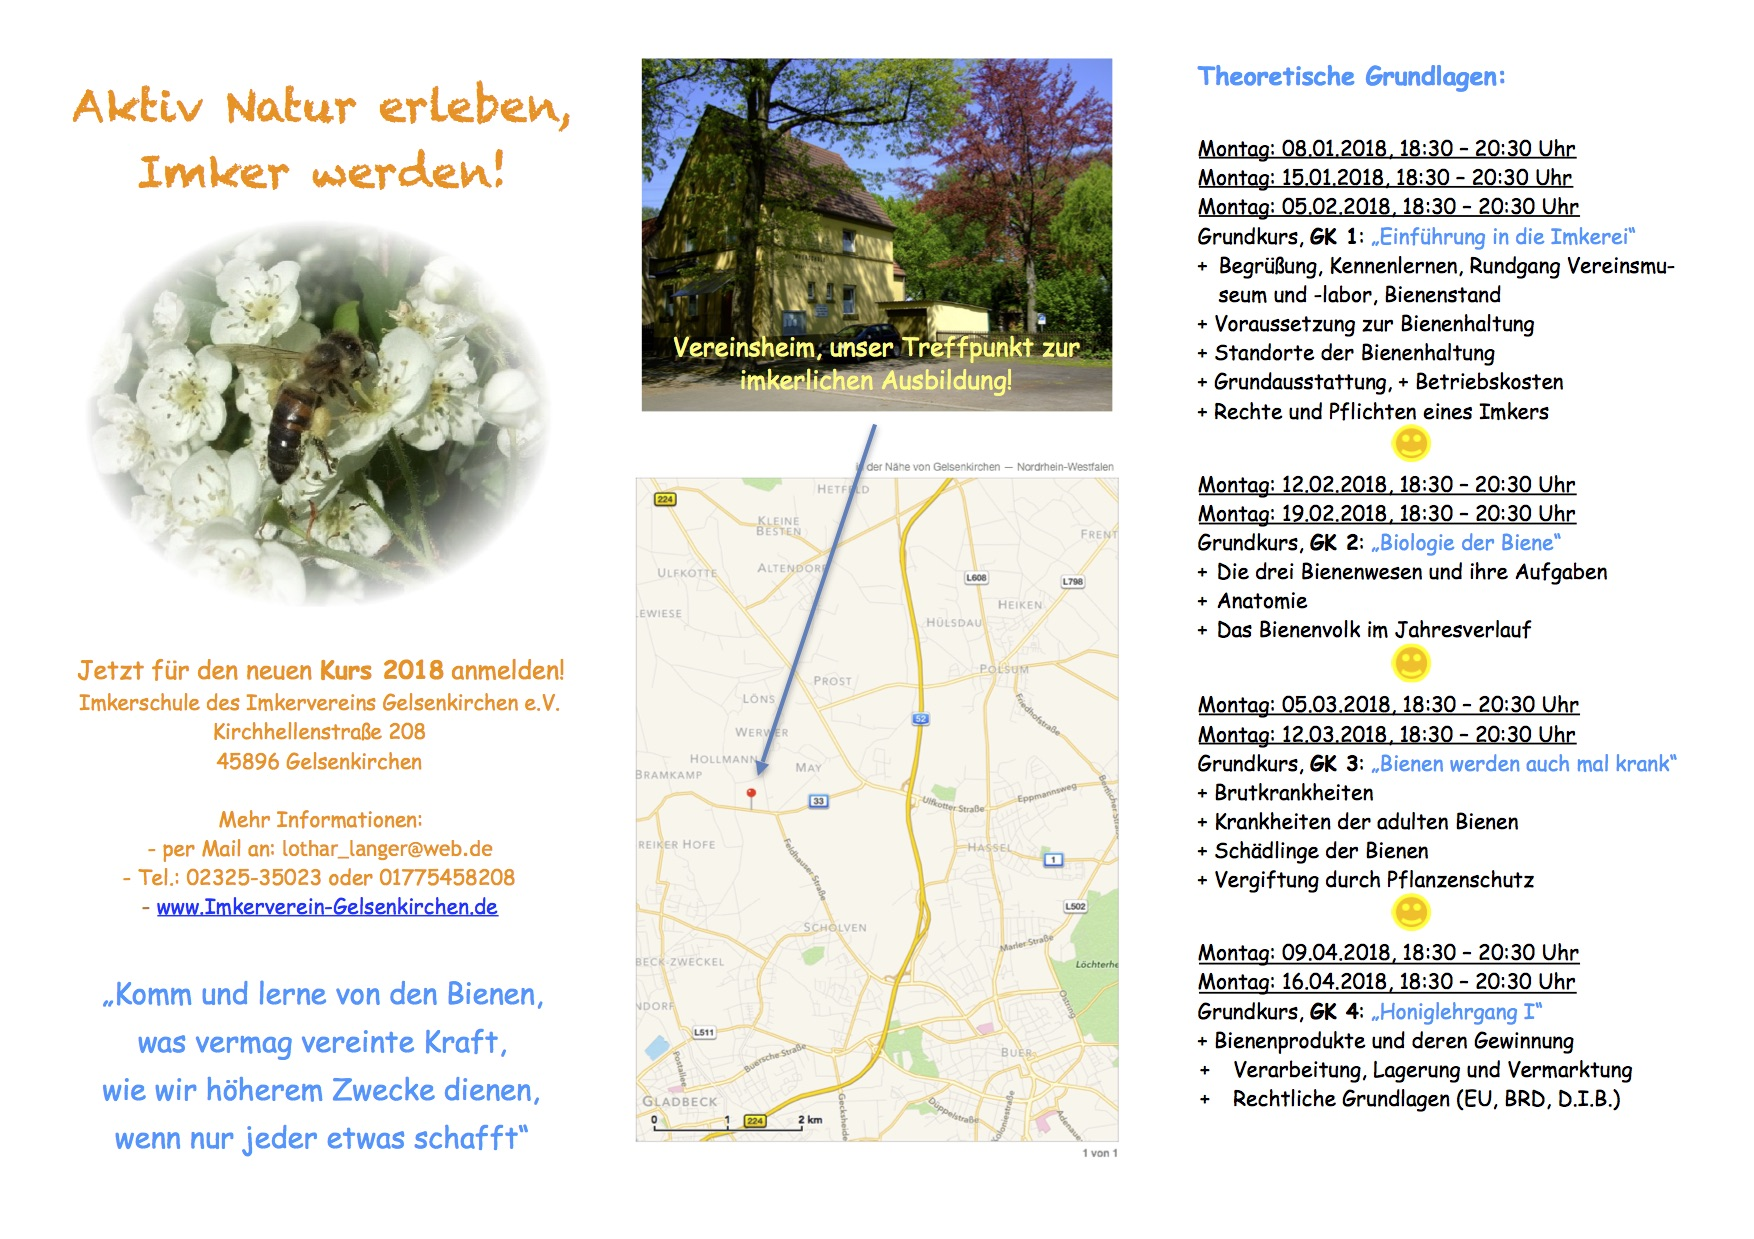 Imkerschule - Imkerverein Gelsenkirchen